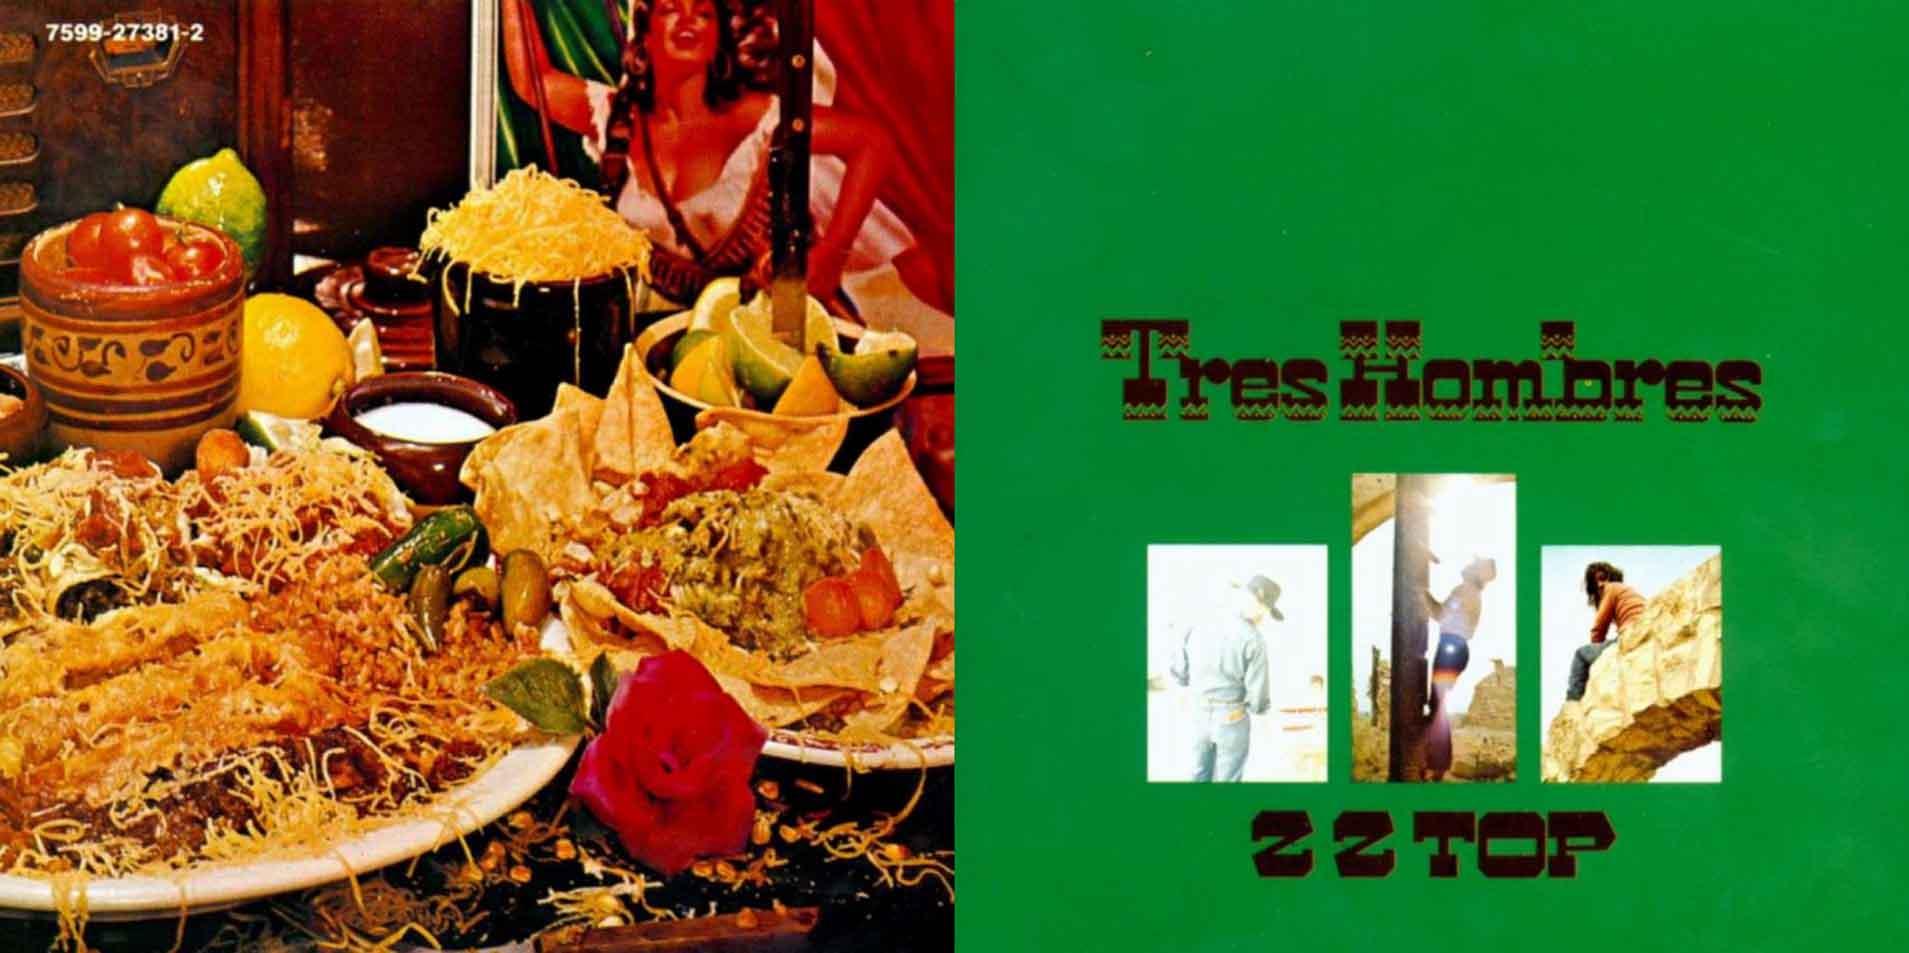 Tres Hombres - 1973 front